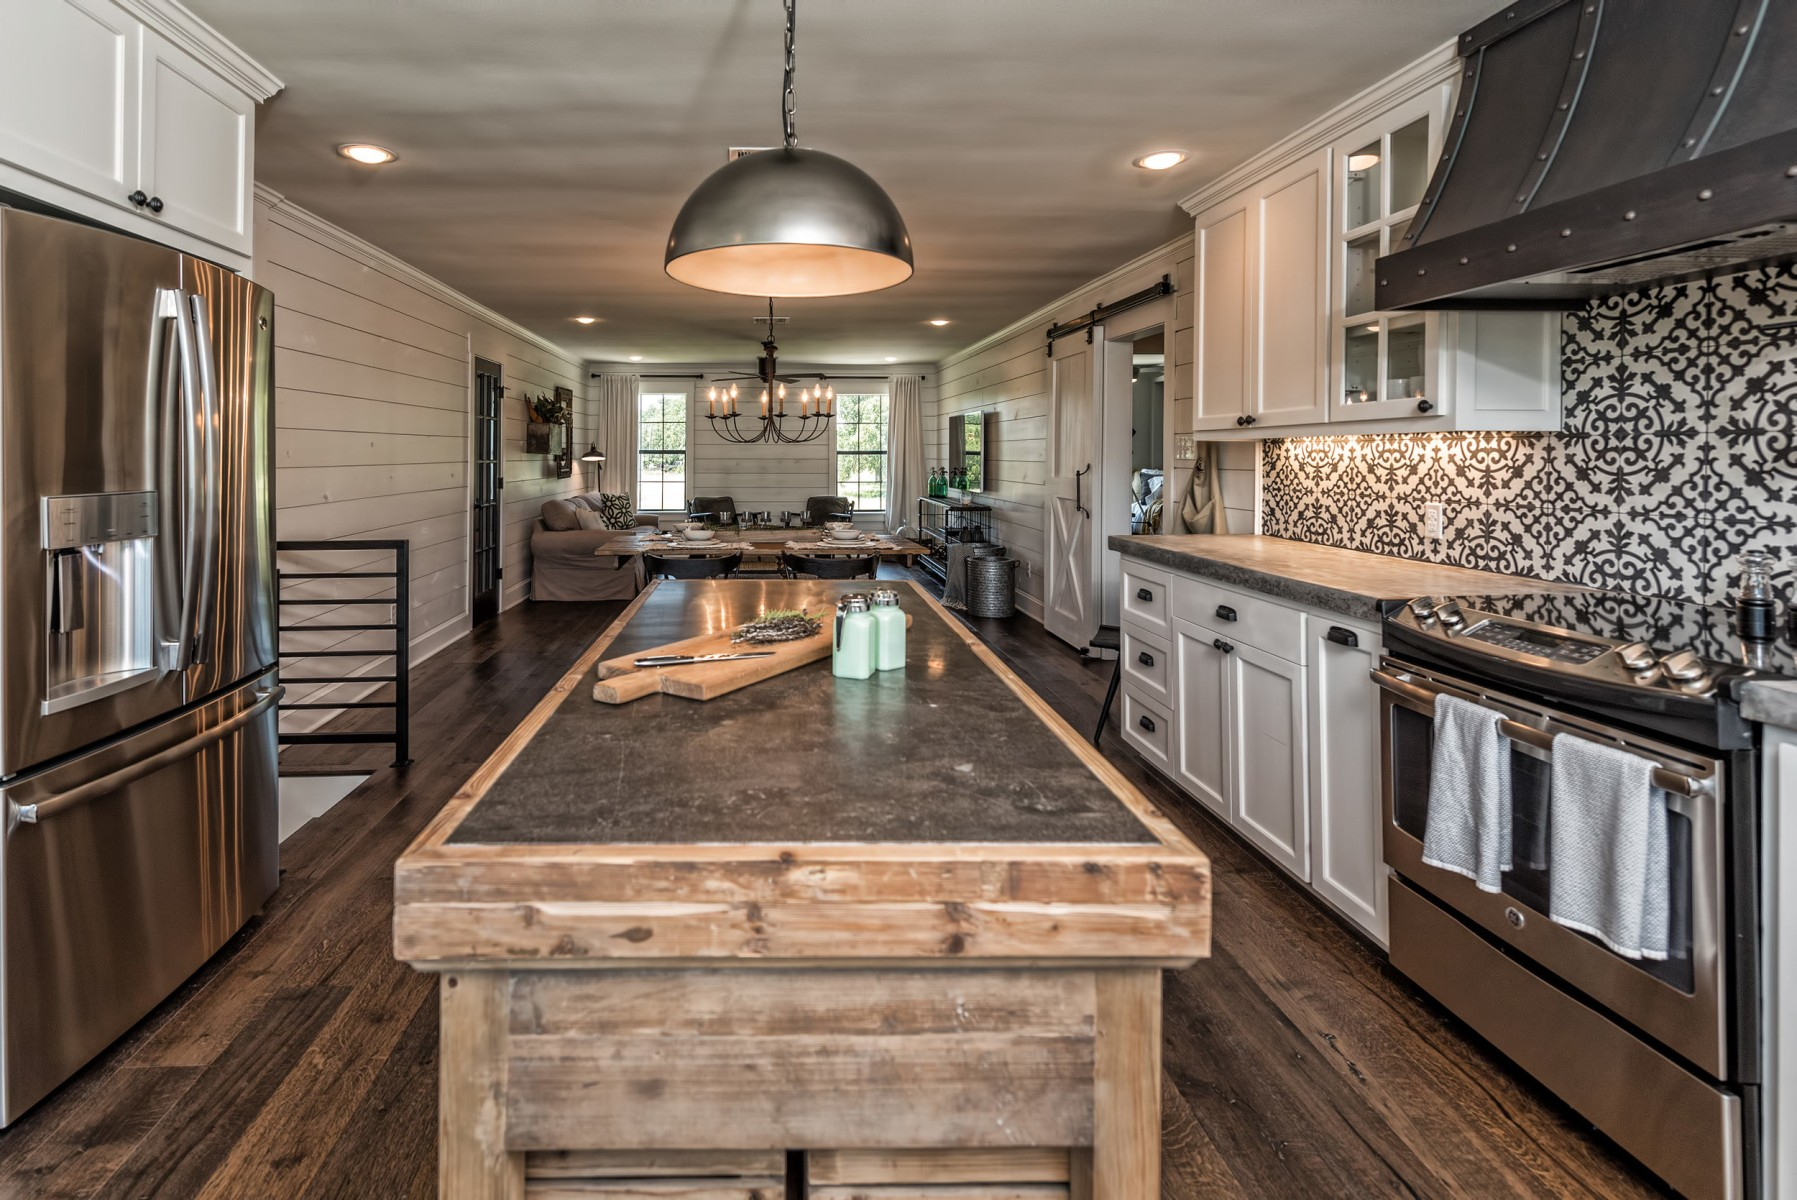 Fixer upper barndominium kitchen - Tour The Barndominium From Fixer Upper